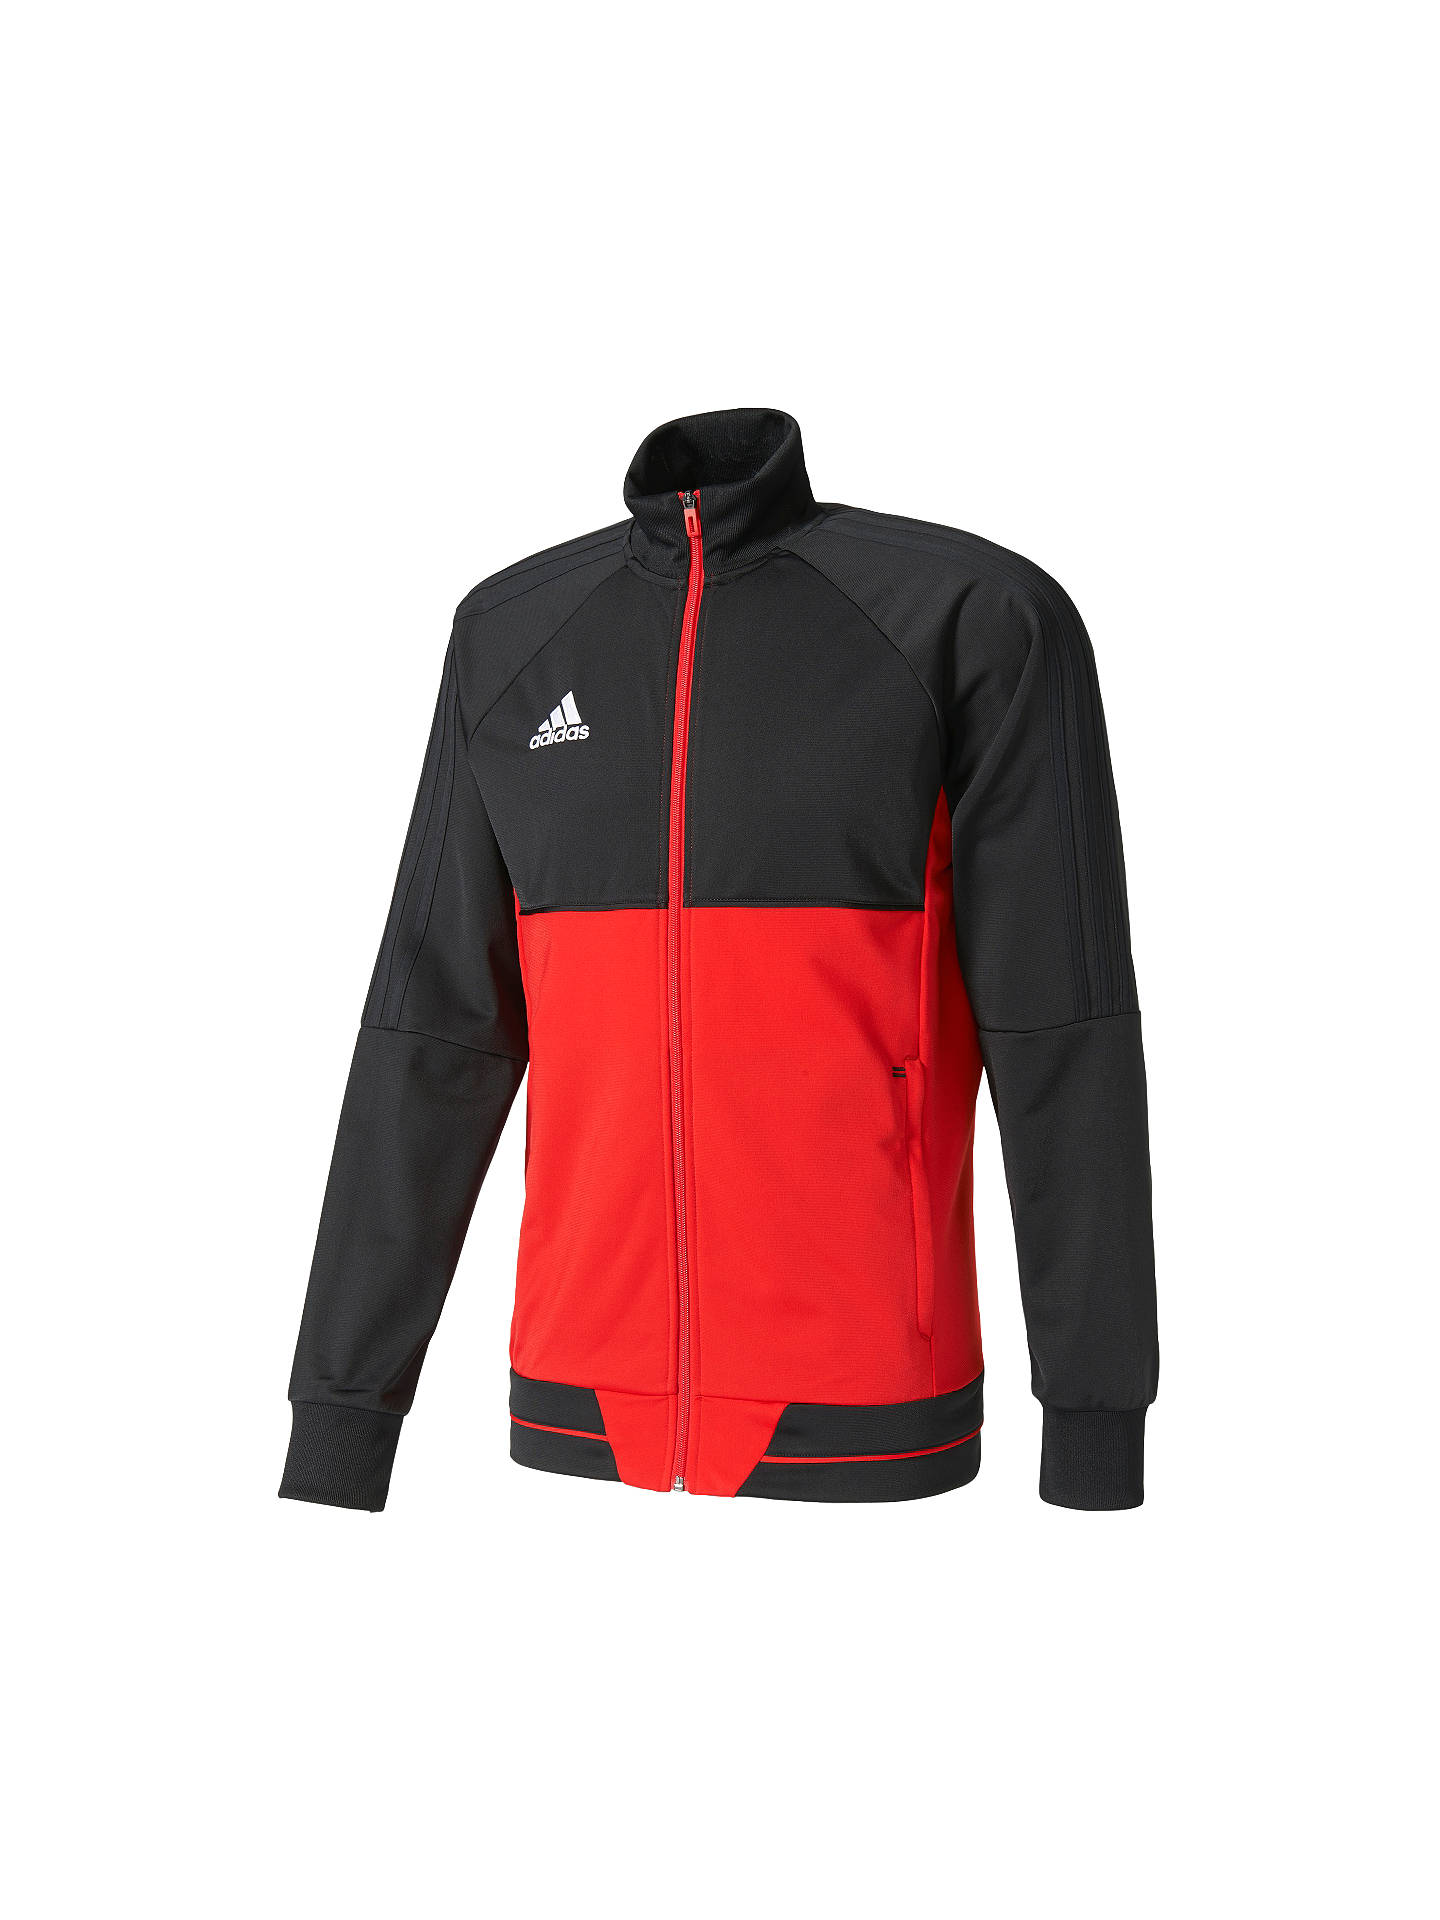 Adidas Football Tiro 17 Training Jacket, BlackRed at John